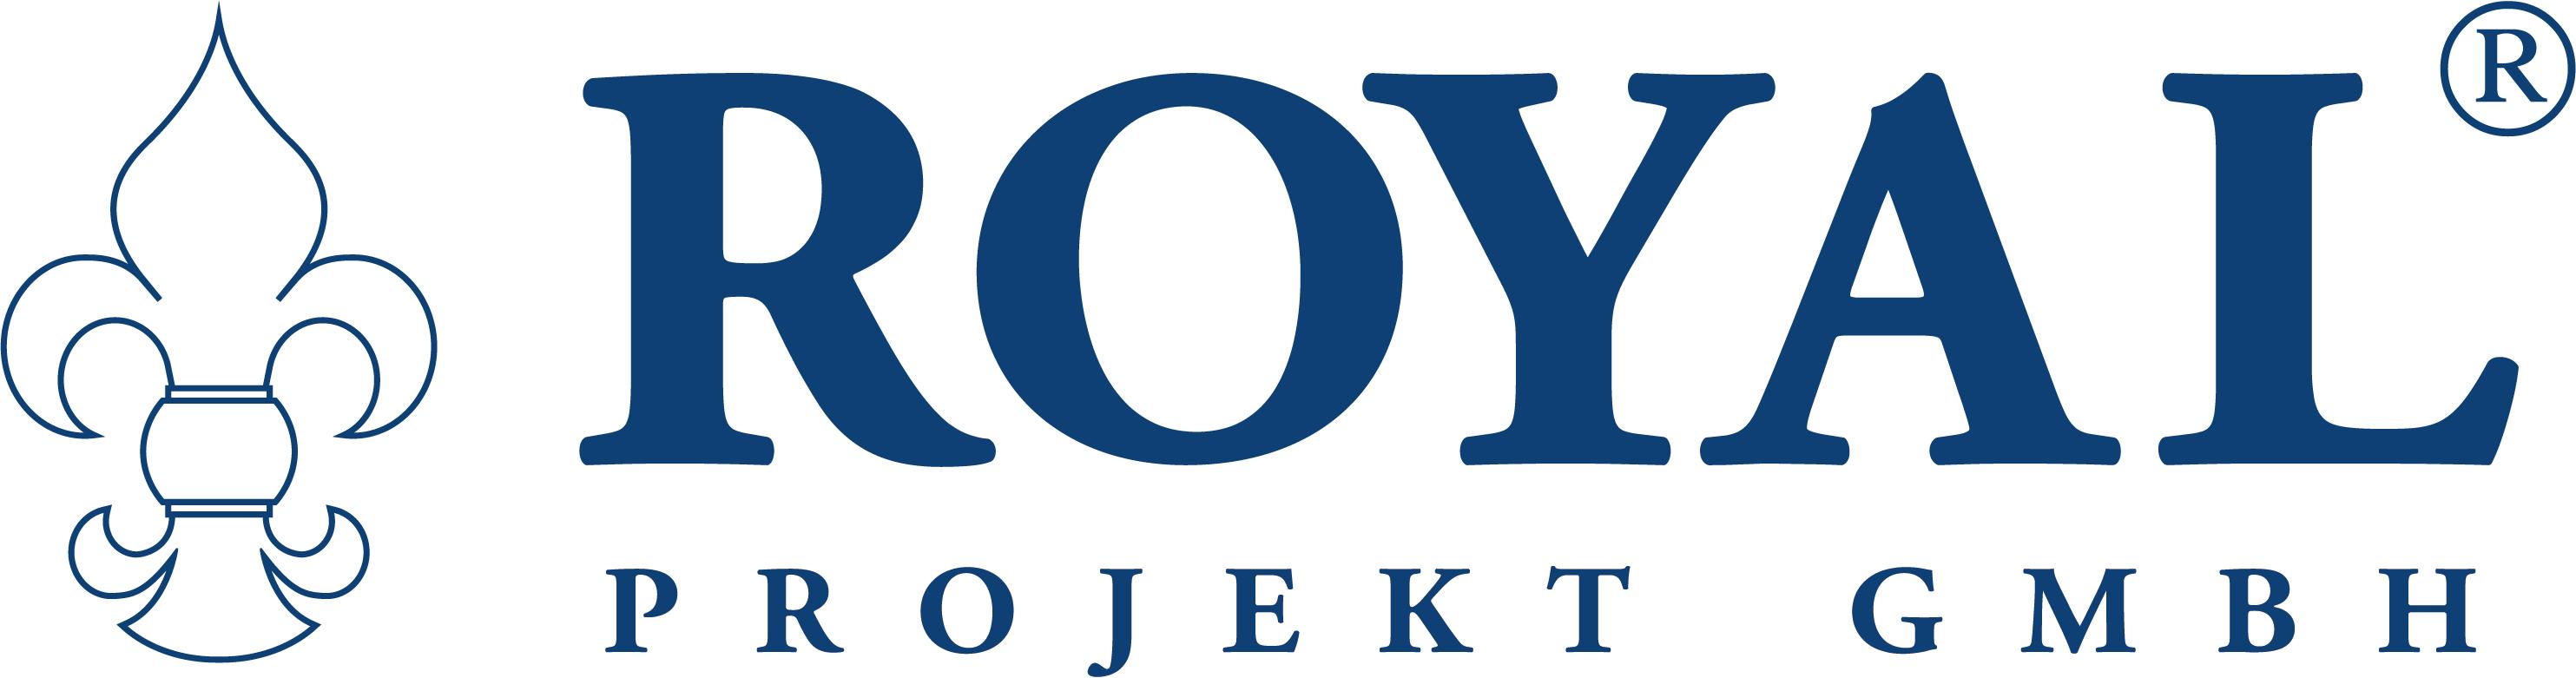 ROYAL PROJEKT GmbH